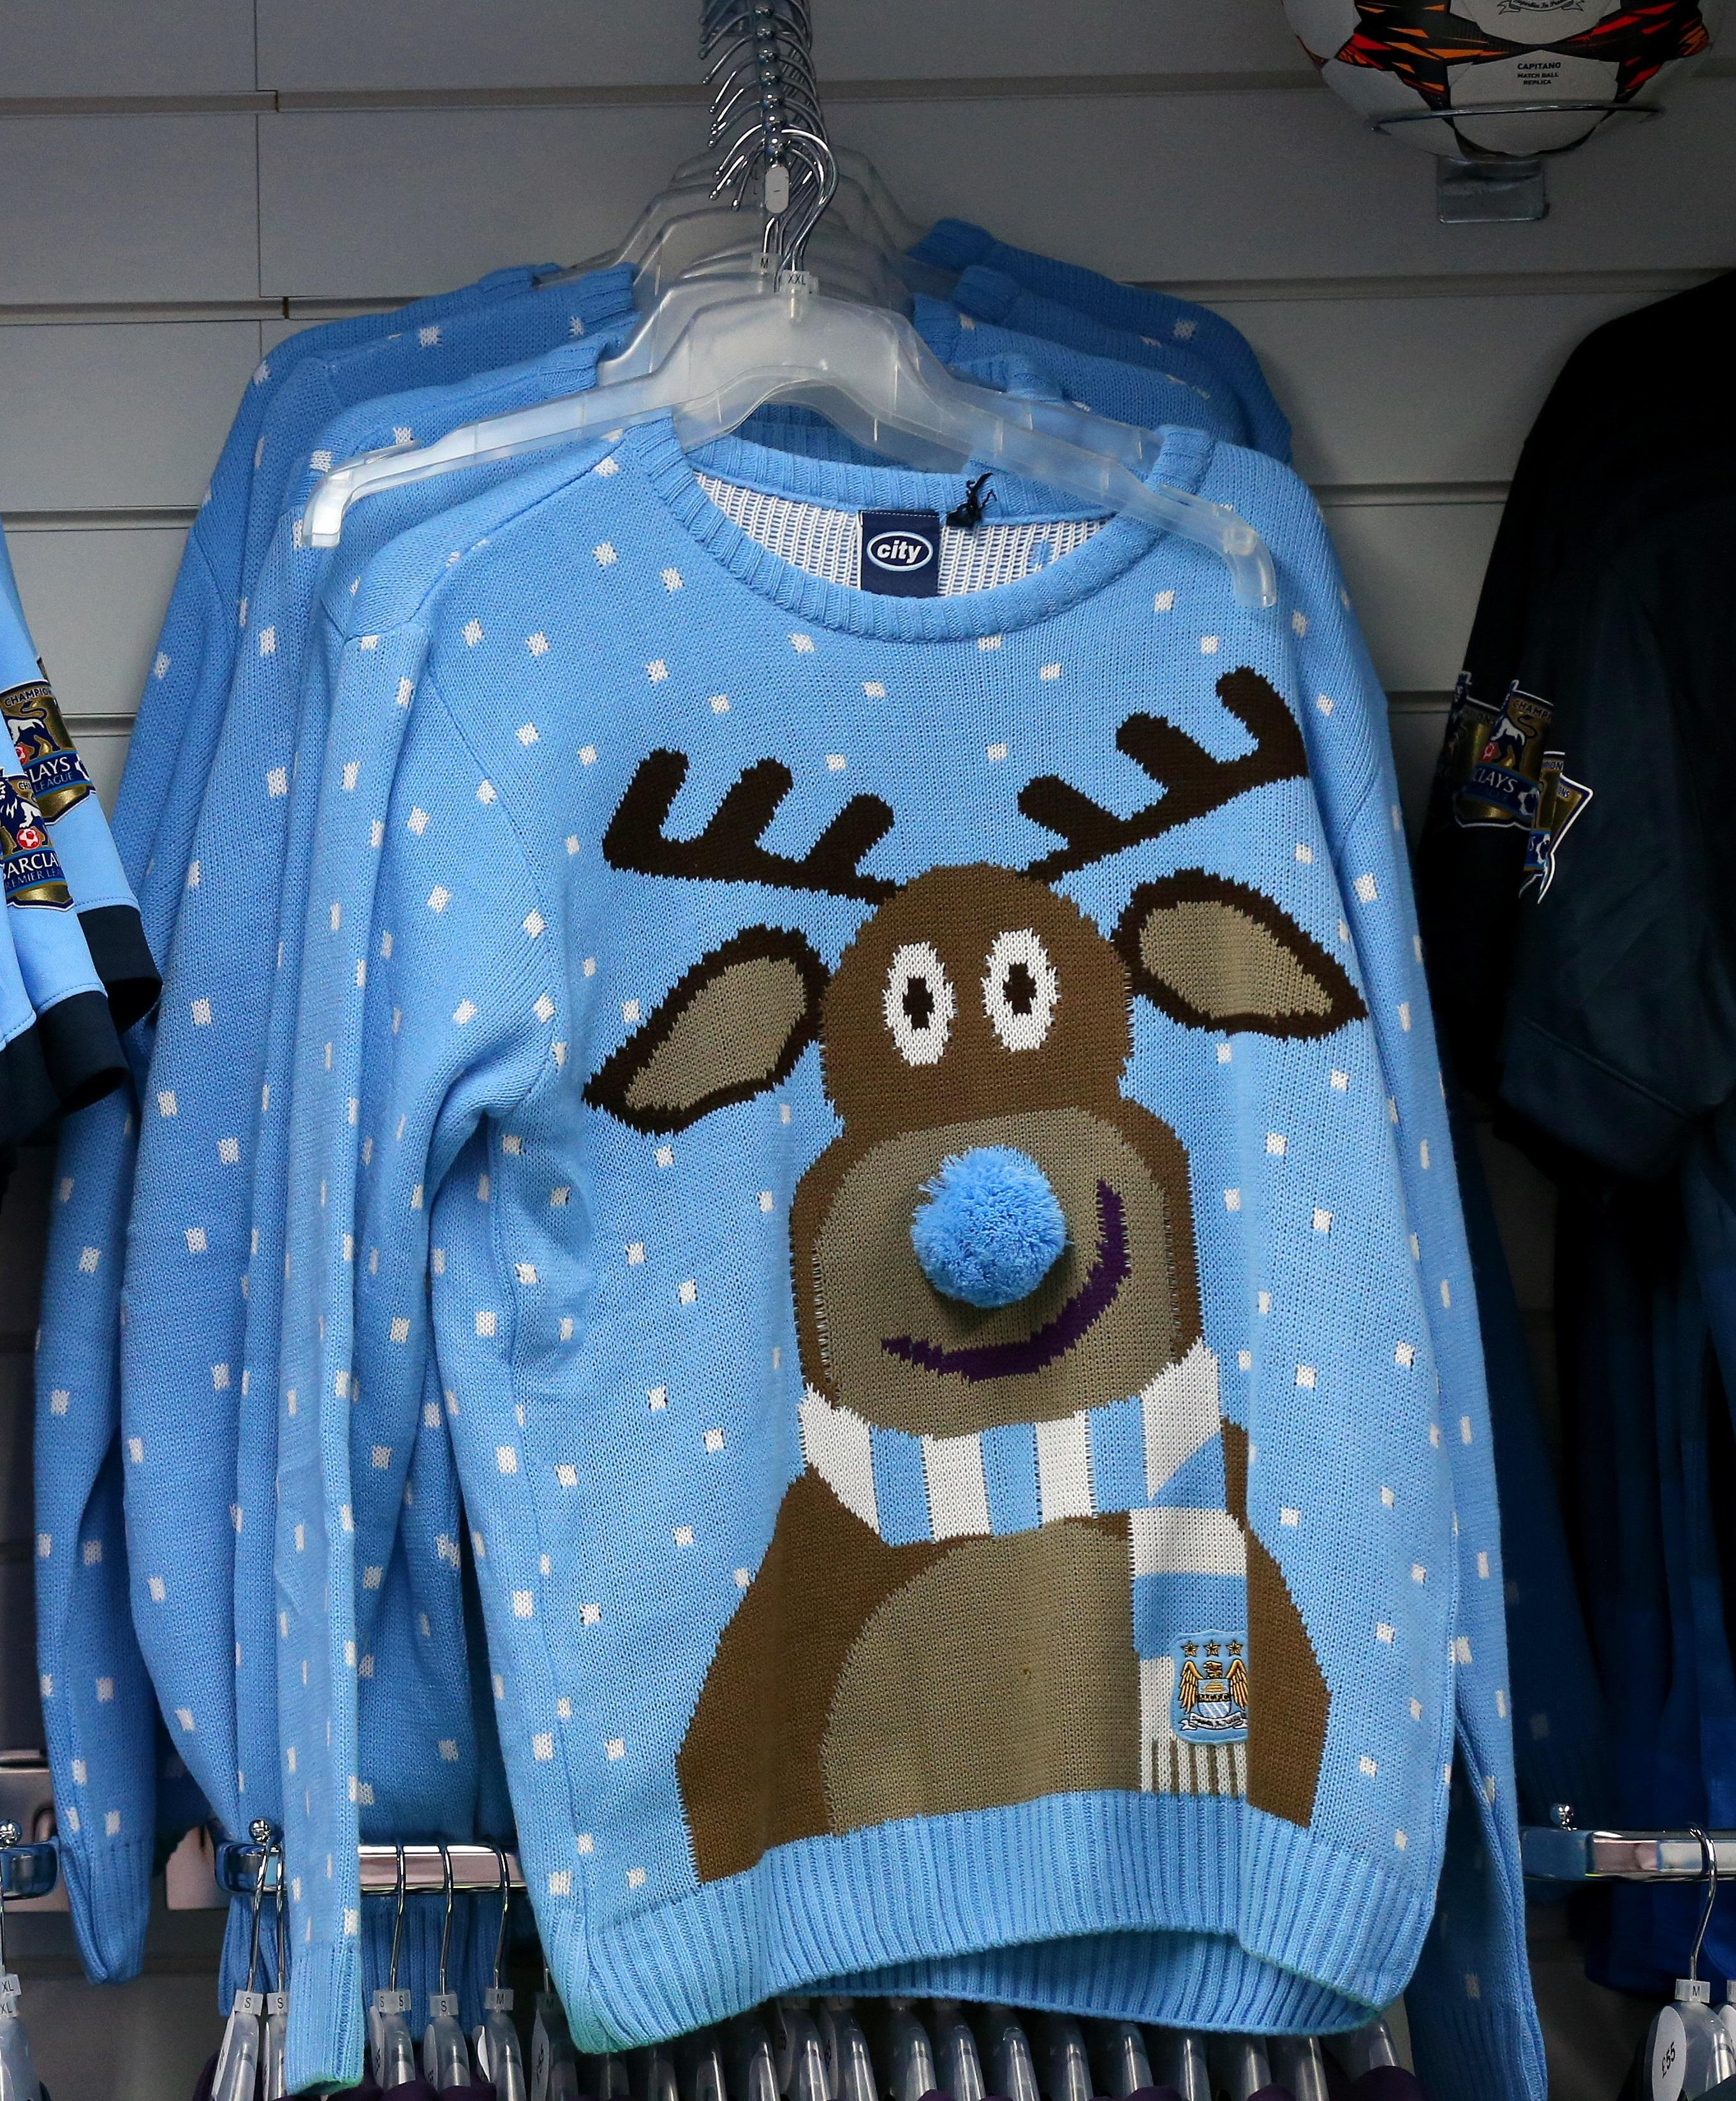 Kohl Ugly Christmas Sweaters.Where To Buy Ugly Christmas Sweaters